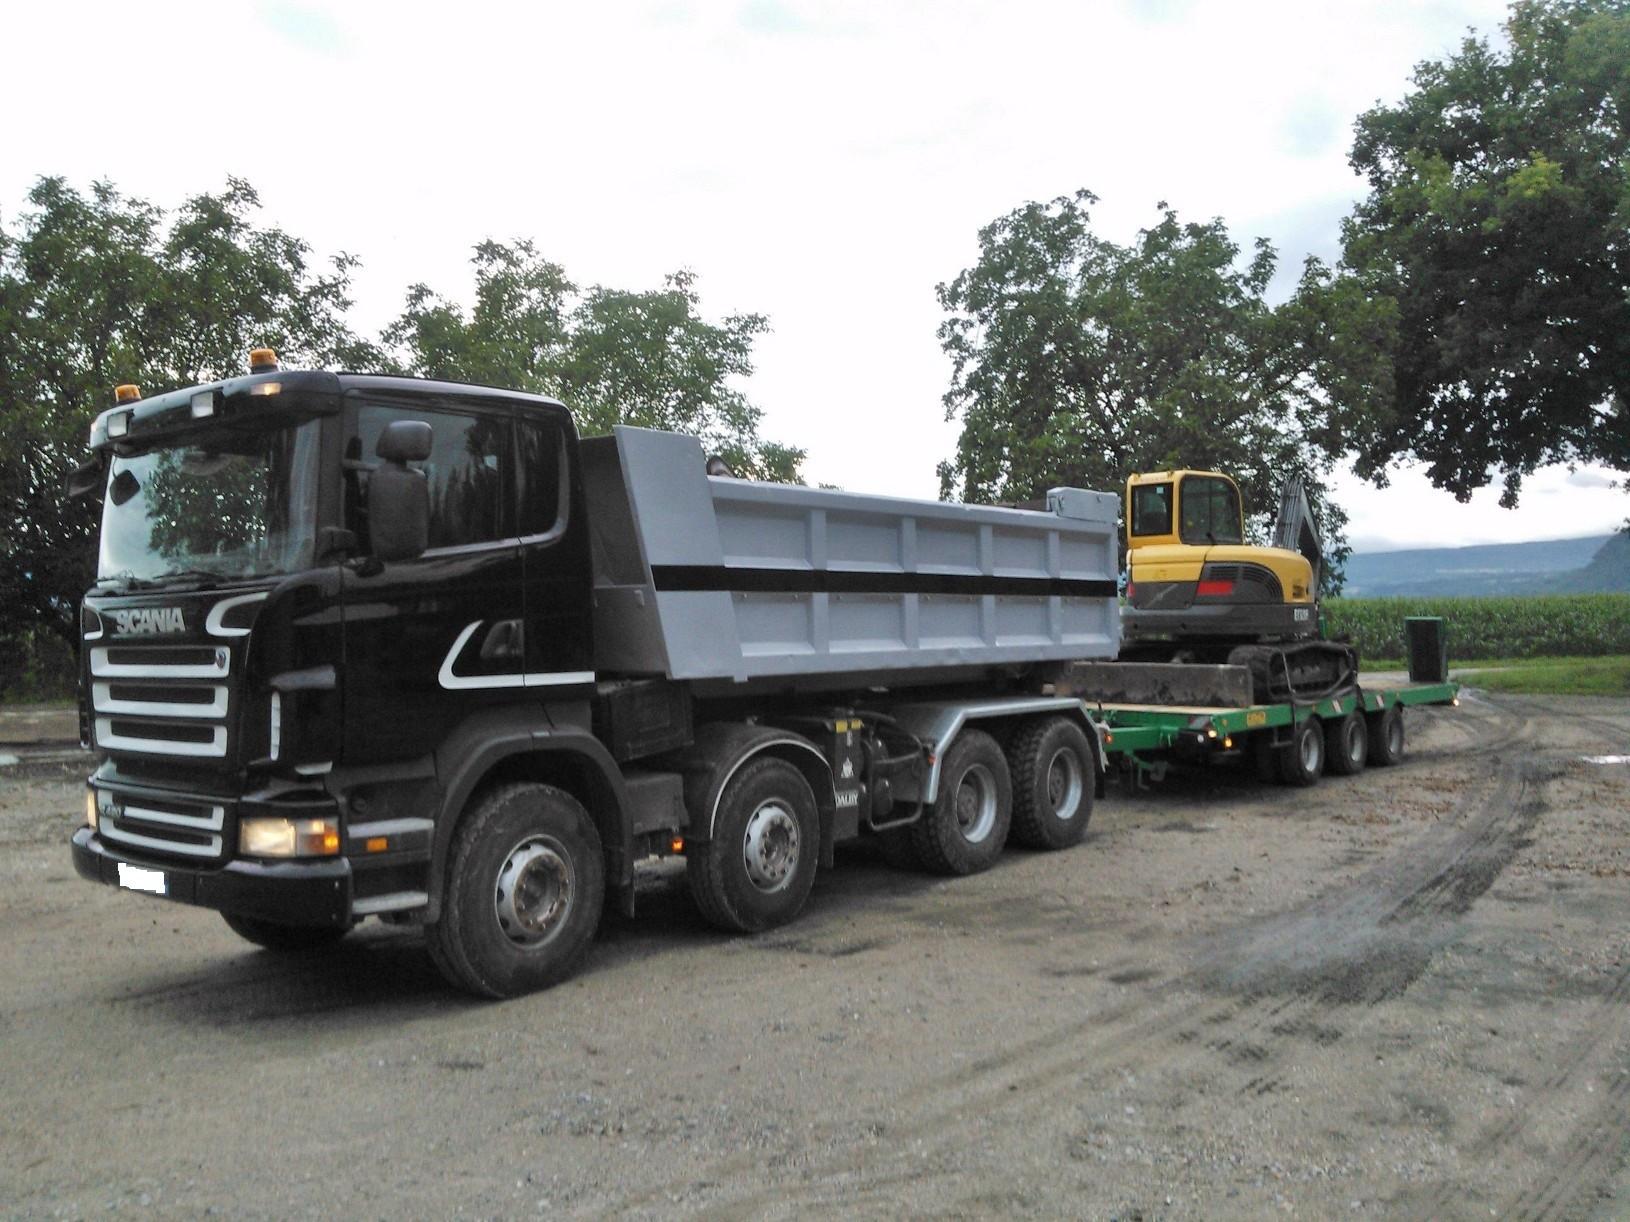 Camion 8x4 ampliroll, bennes gravat, enrochements, plateau